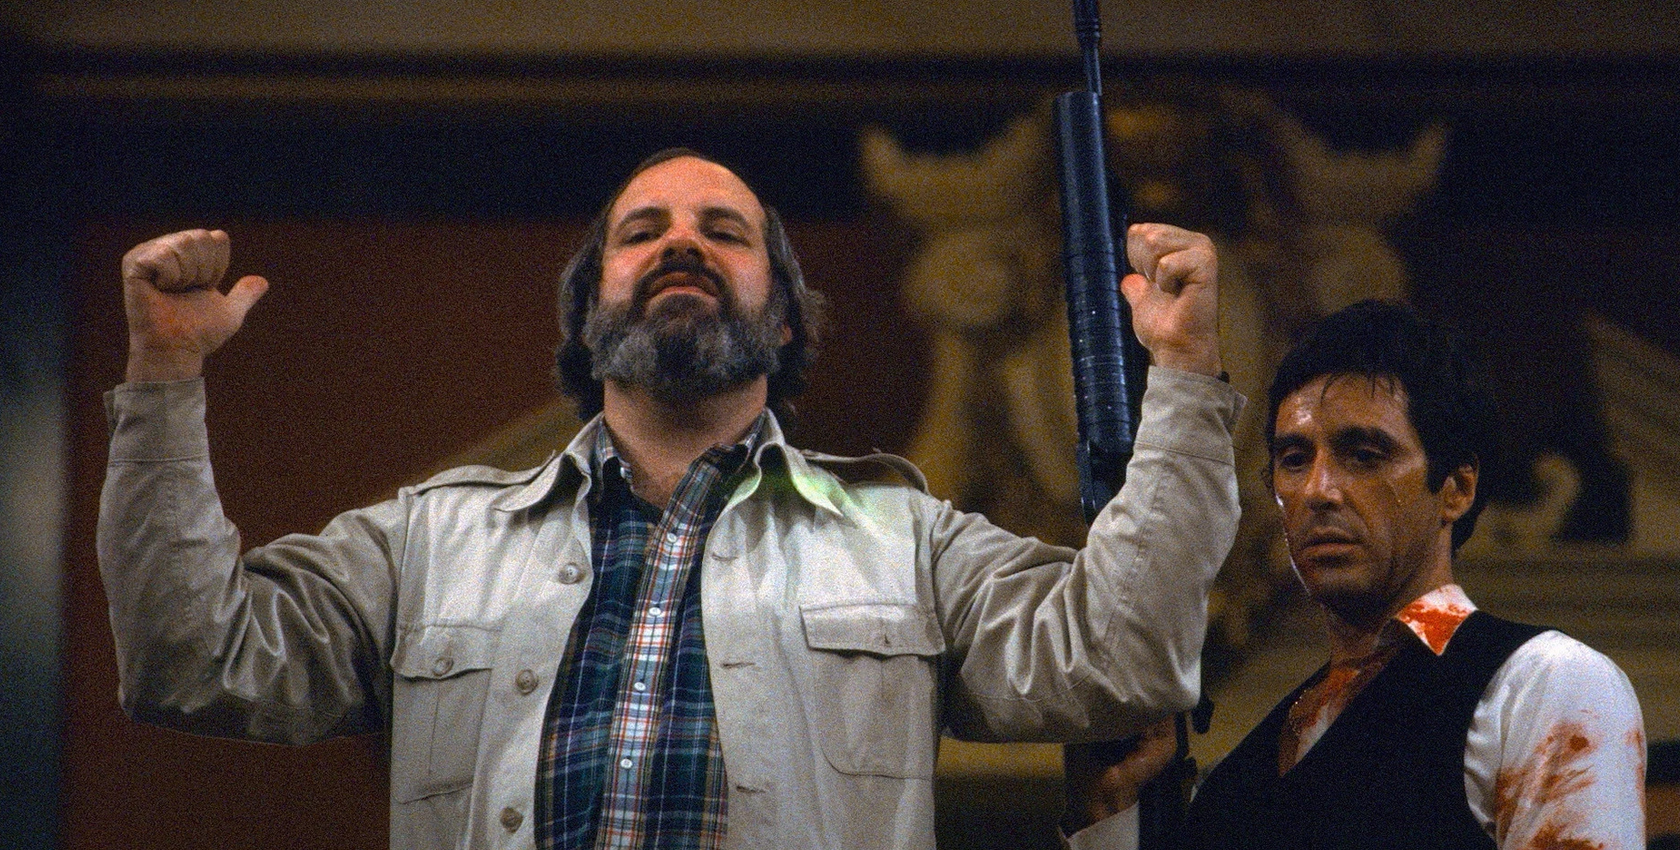 Celebrate director Brian De Palma